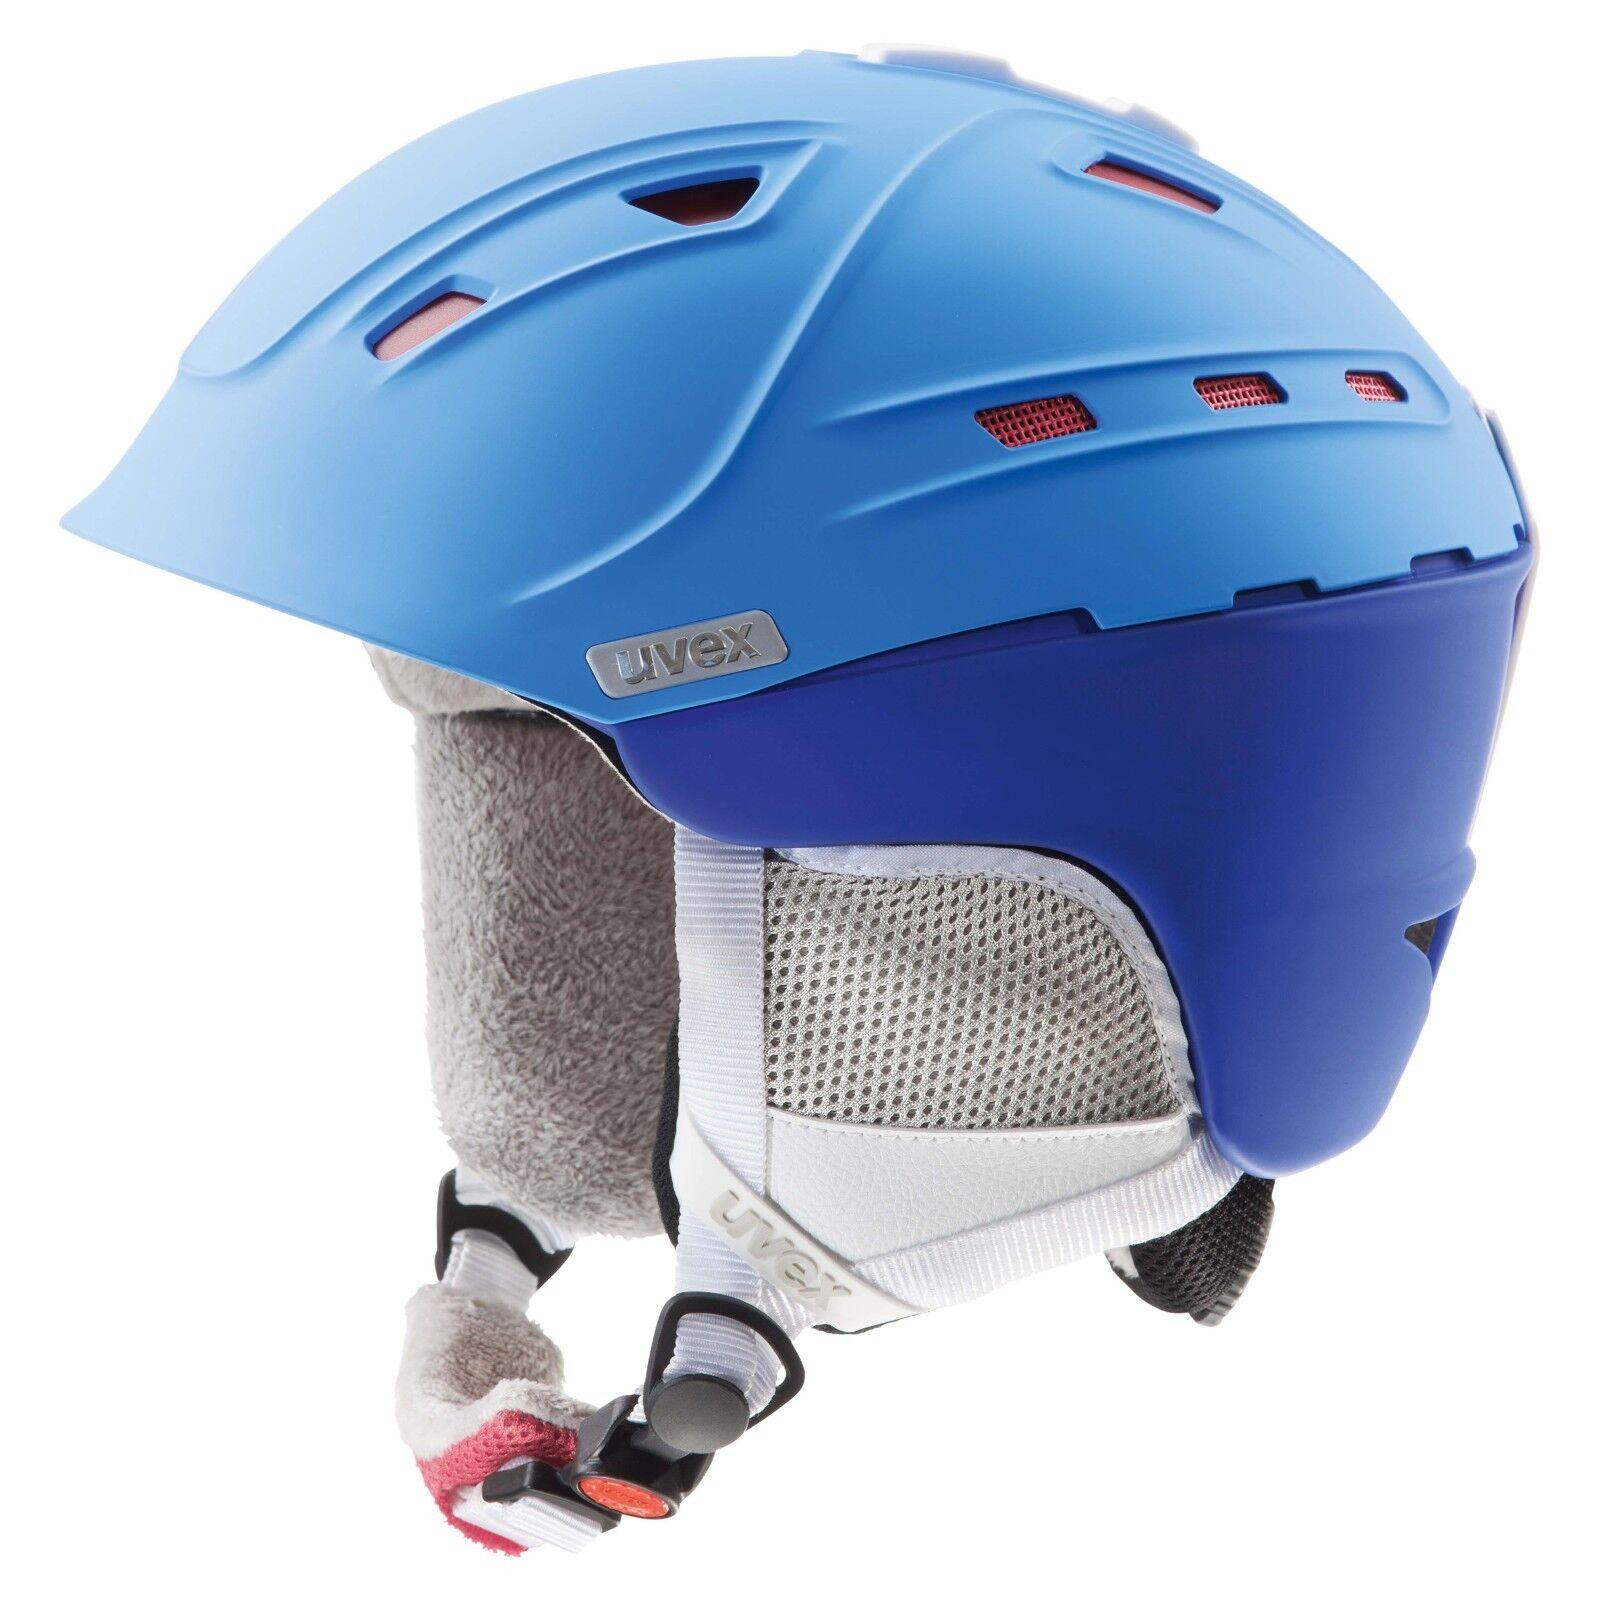 NEW UVEX P2US WL WOMEN'S SKI SNOWBOARD  HELMET blueE-RED MATTE 51-55 and 55-59 cm  most preferential